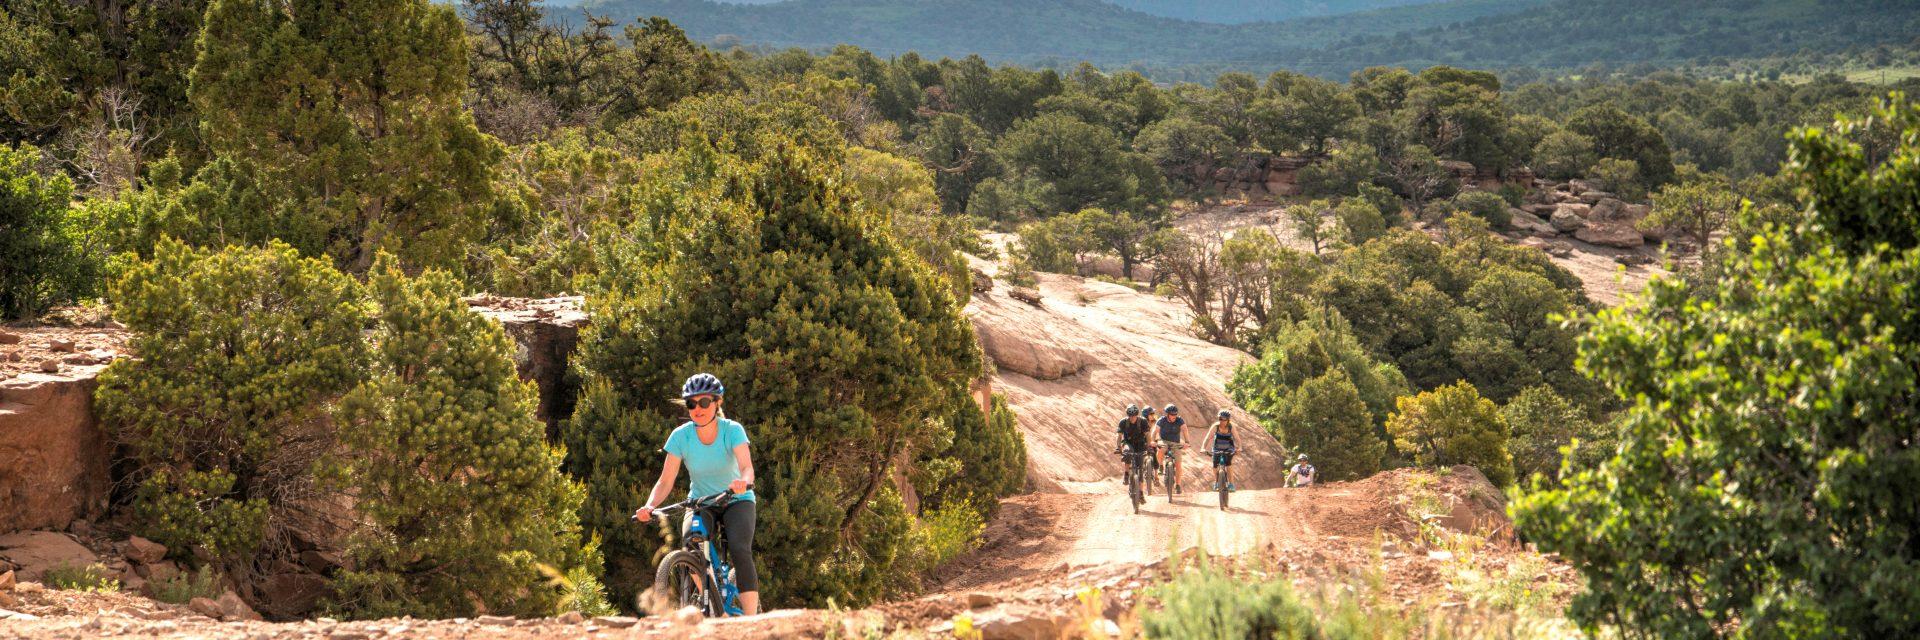 Mountain bike riders follow guide on climb out of Cougar Canyon, Sunrise Downhill guided mountain bike tour, Moab UT